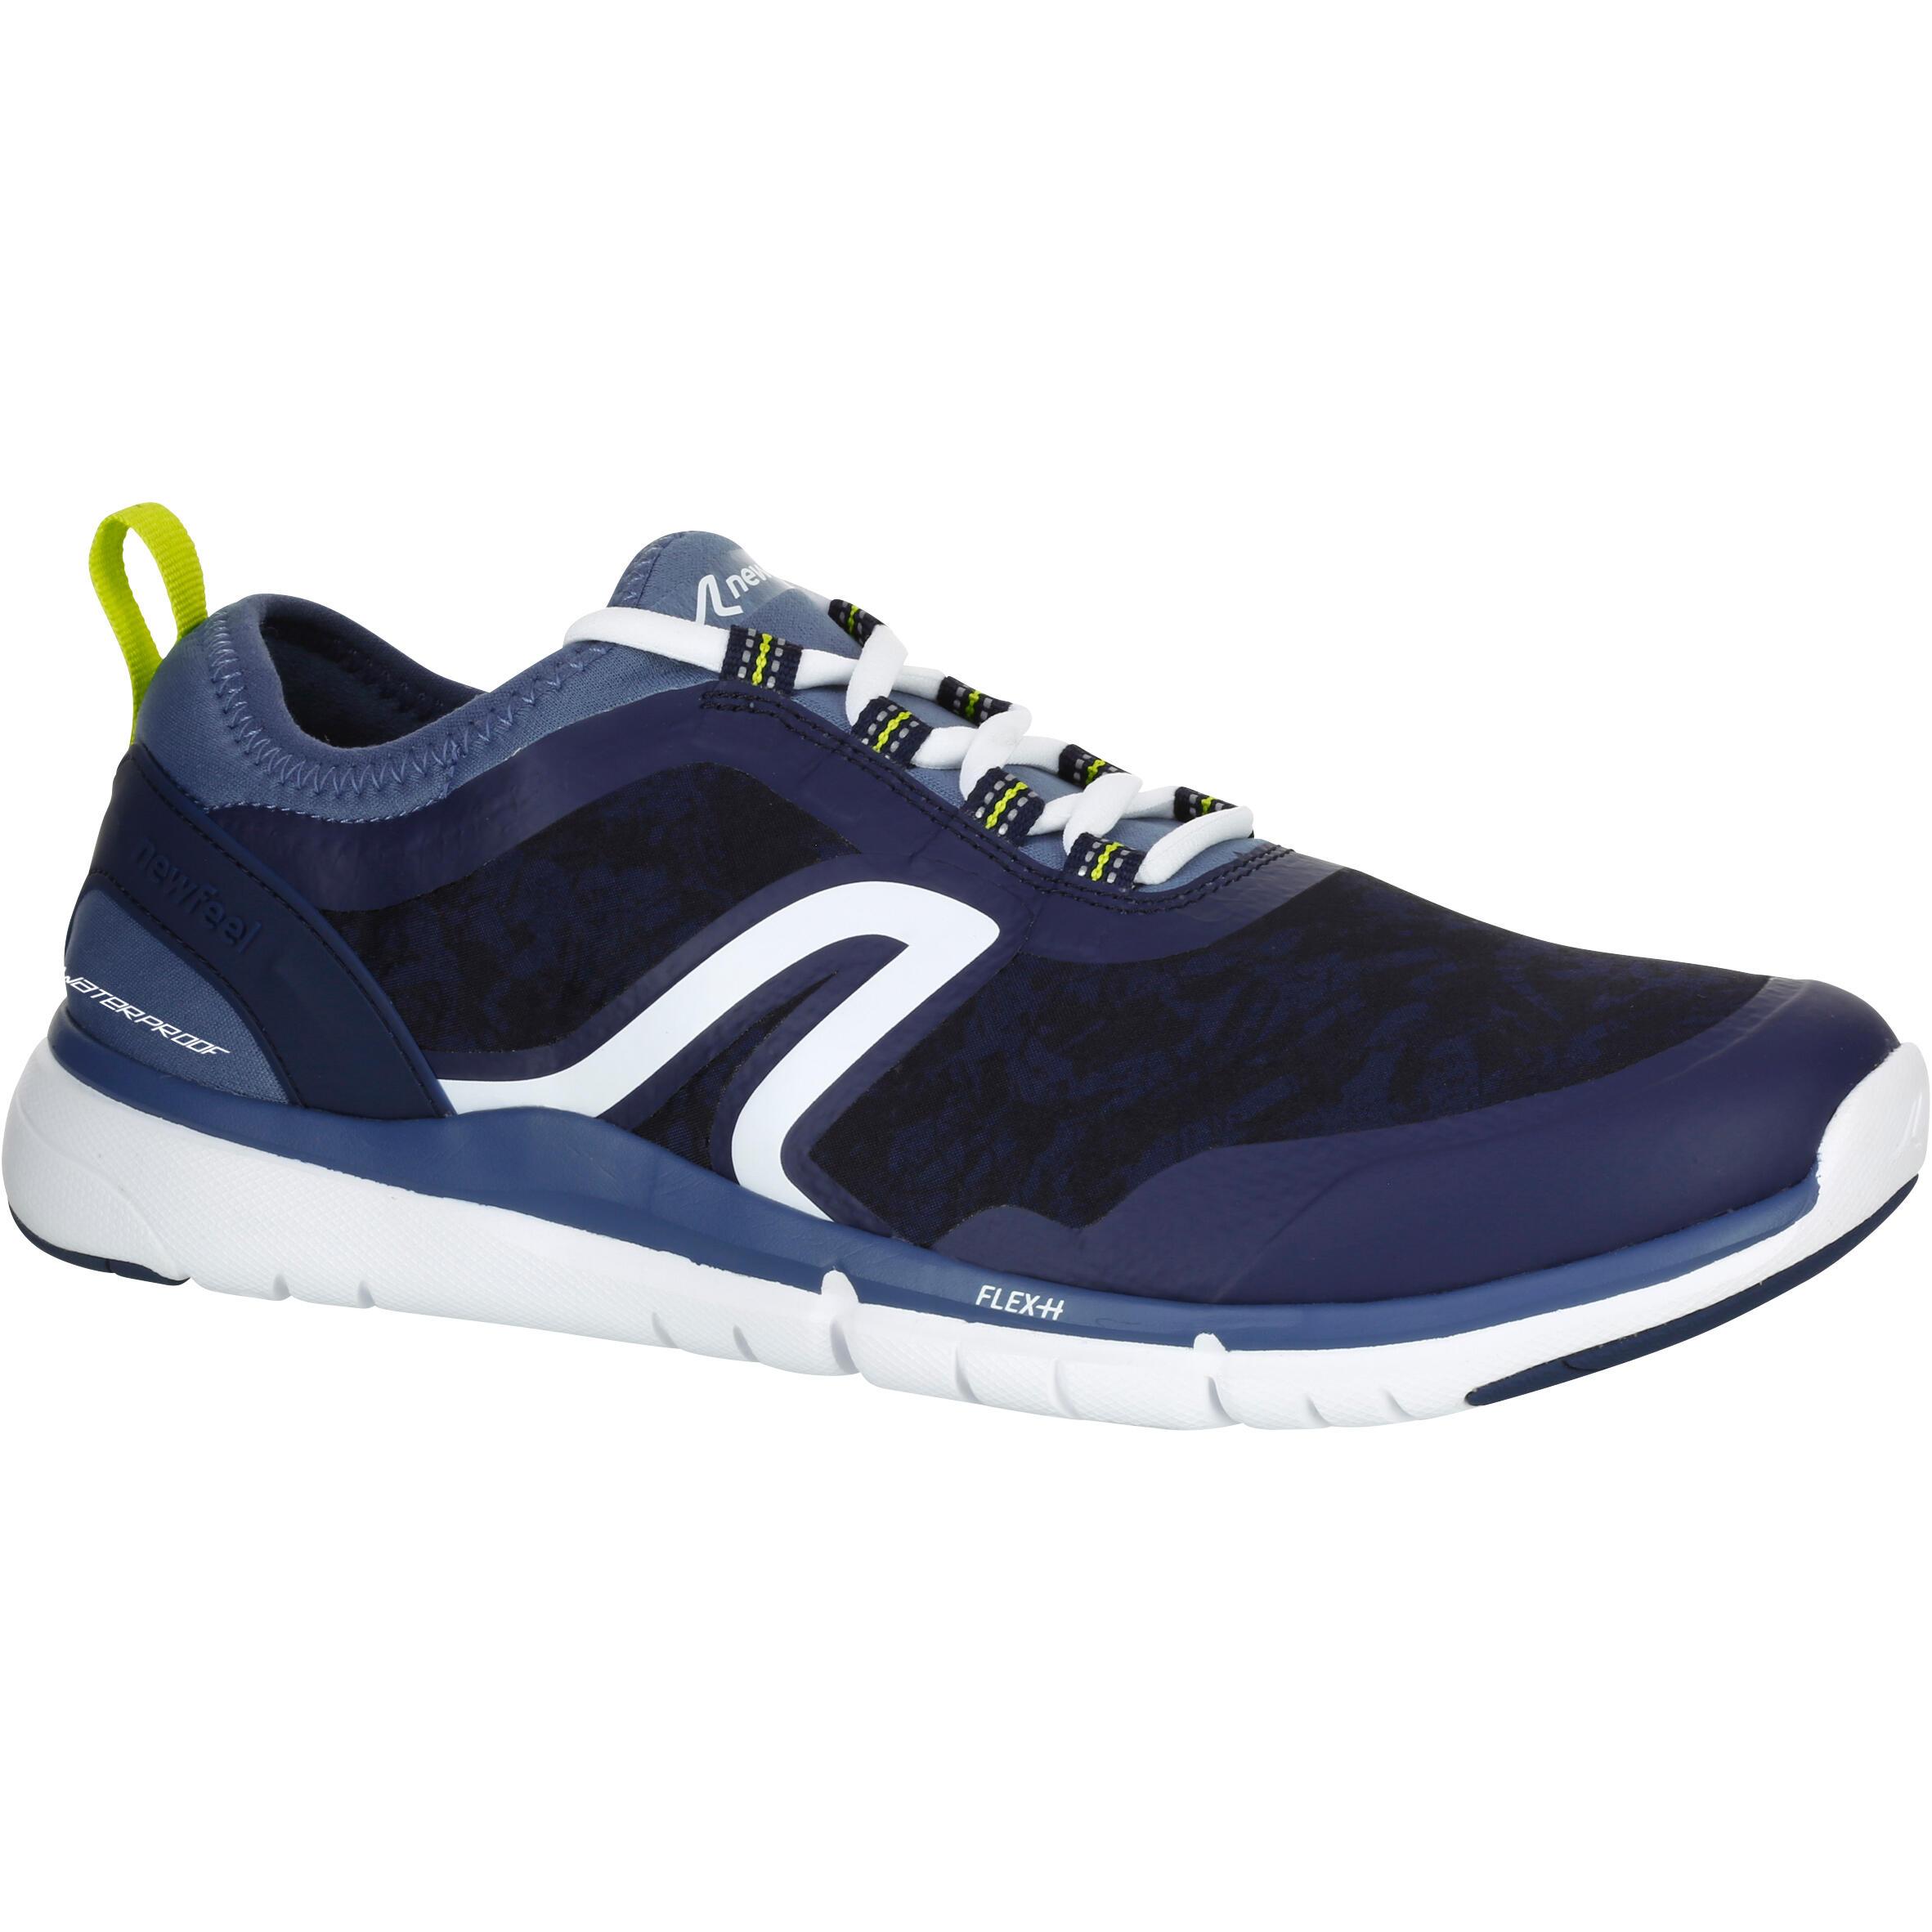 Men's Fitness Walking Shoes PW 580